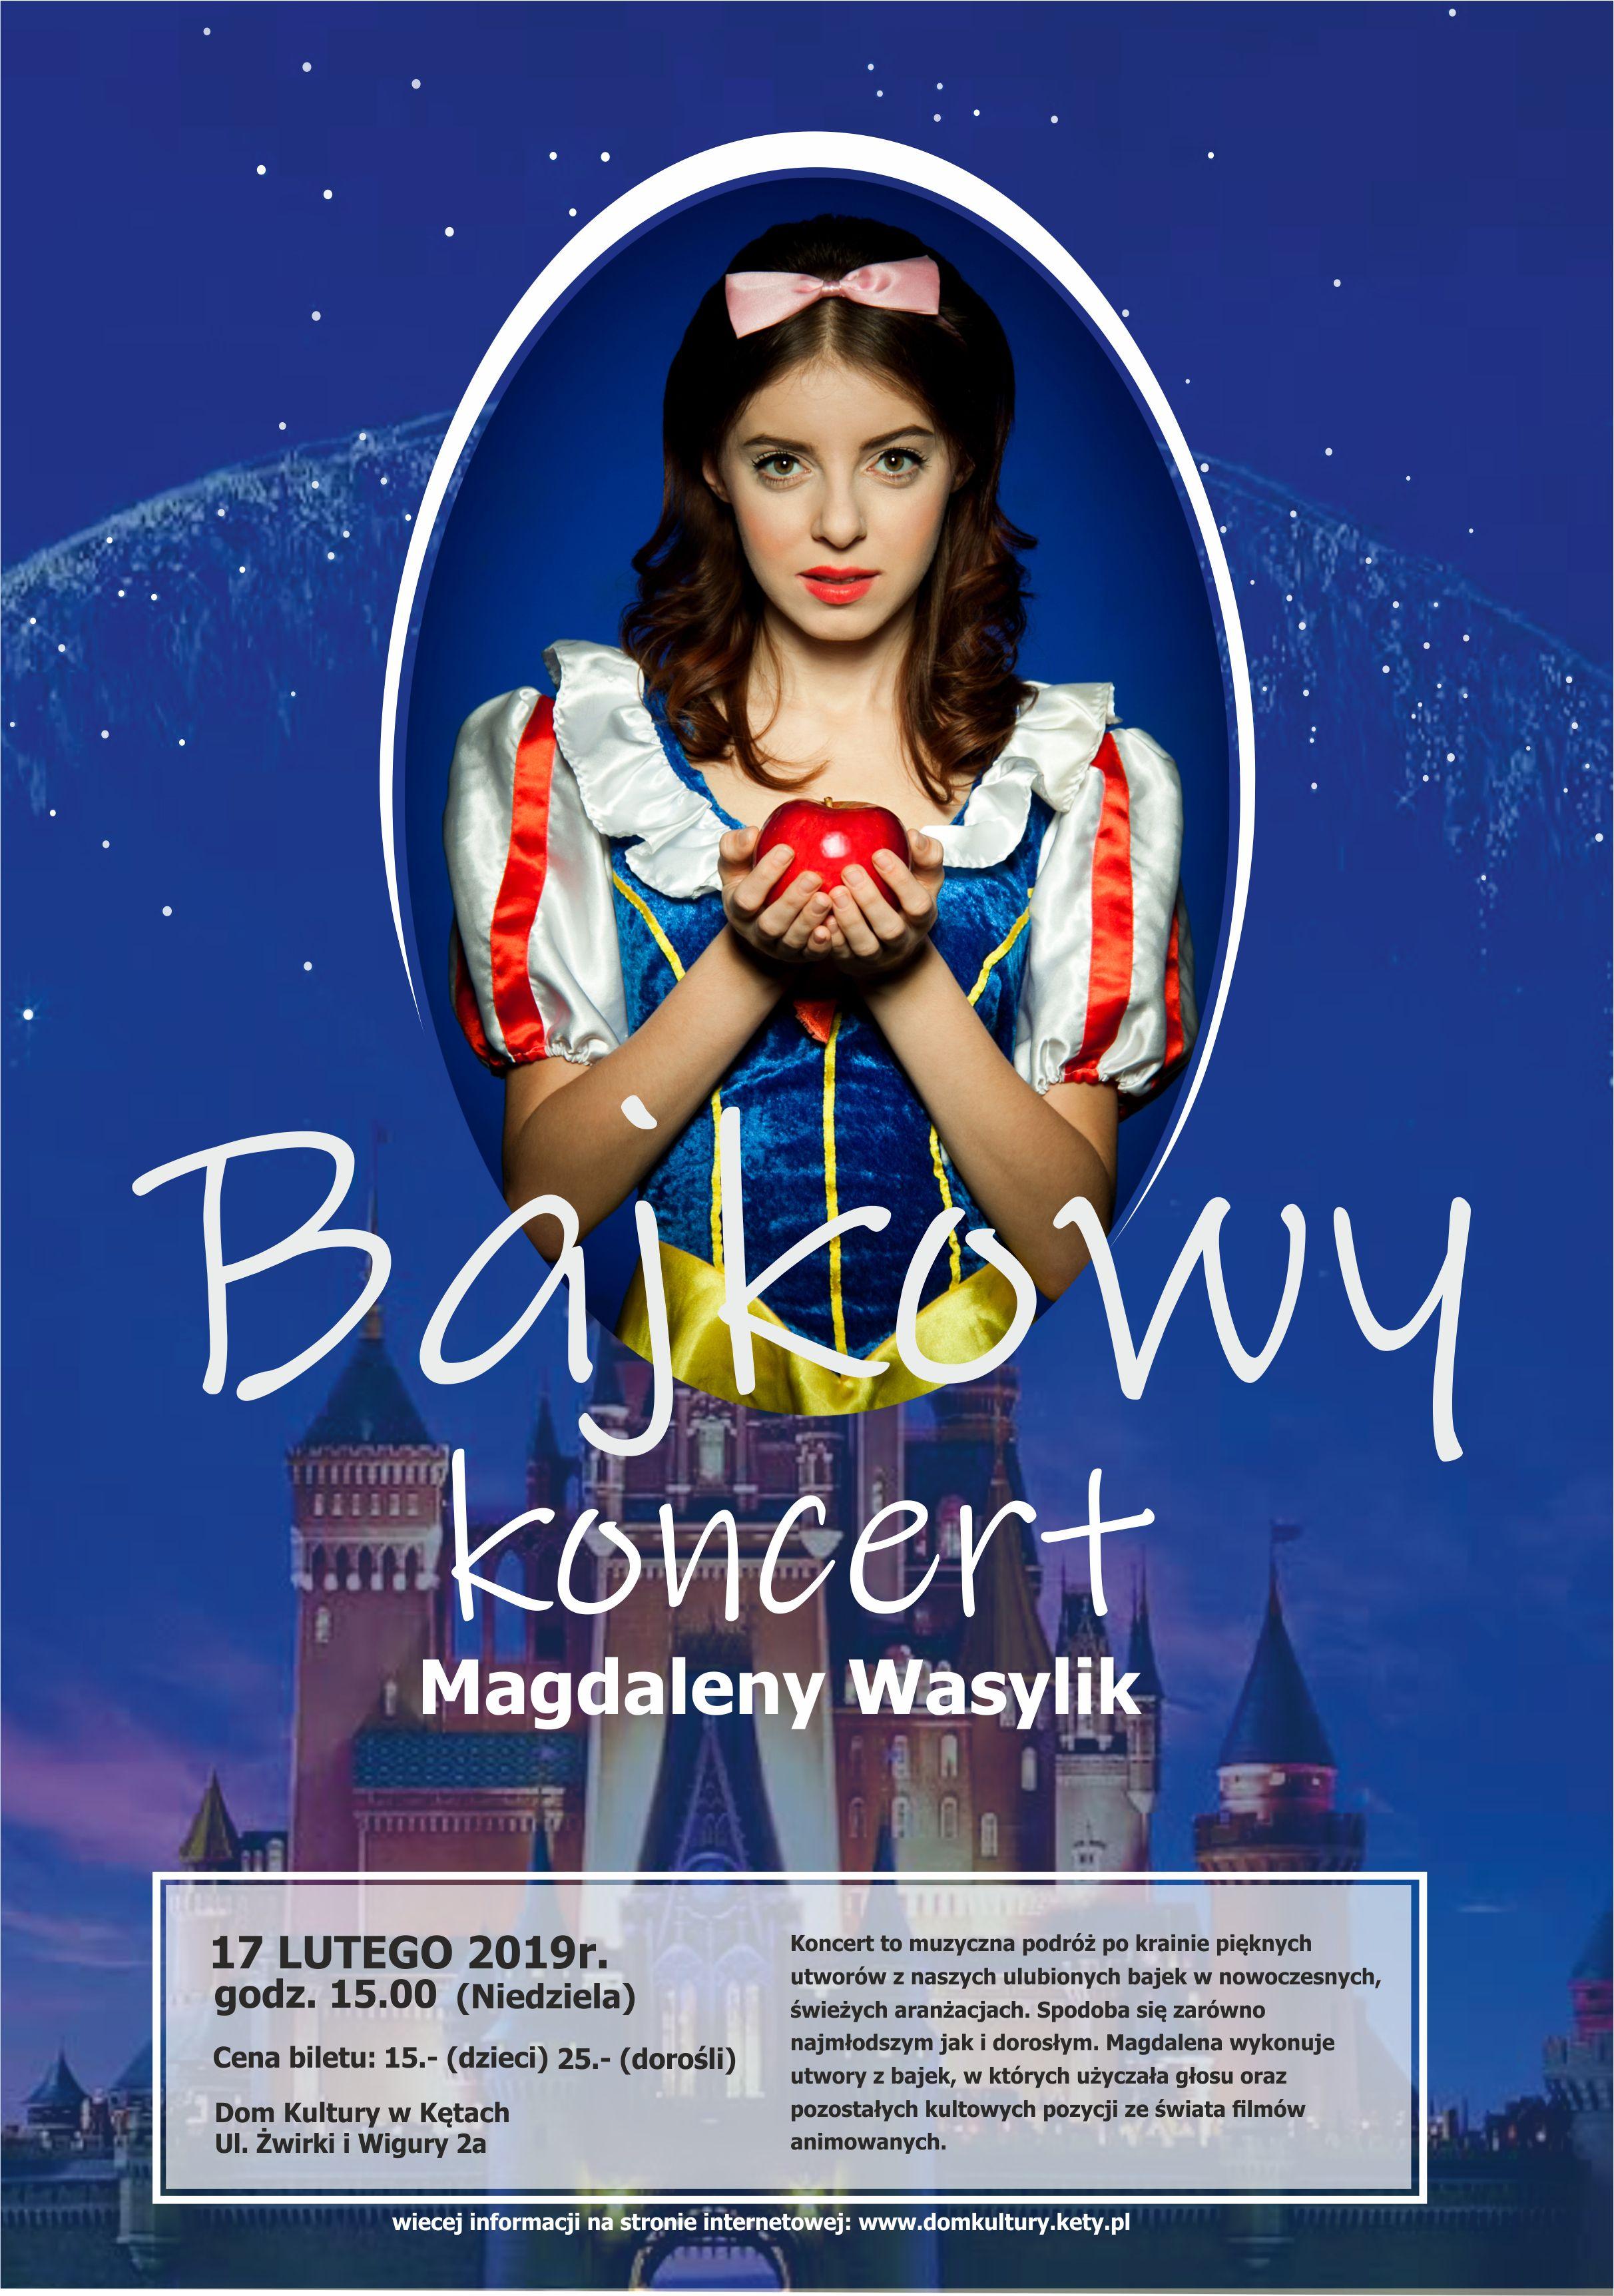 Bajkowy koncert Magdaleny Wasylik